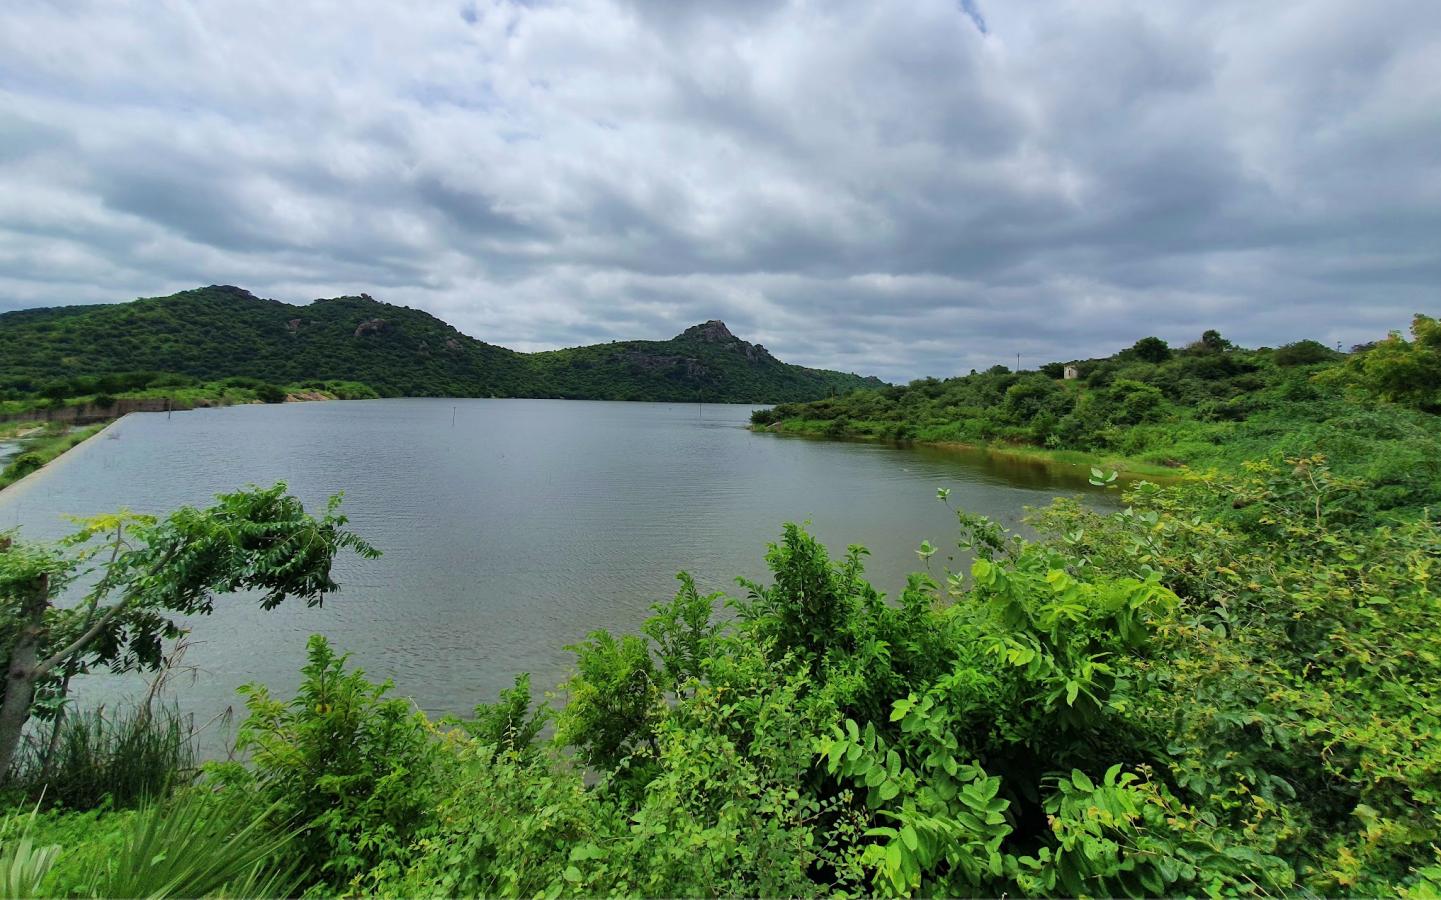 indira sagar pond with blue skies above and lush greenery around